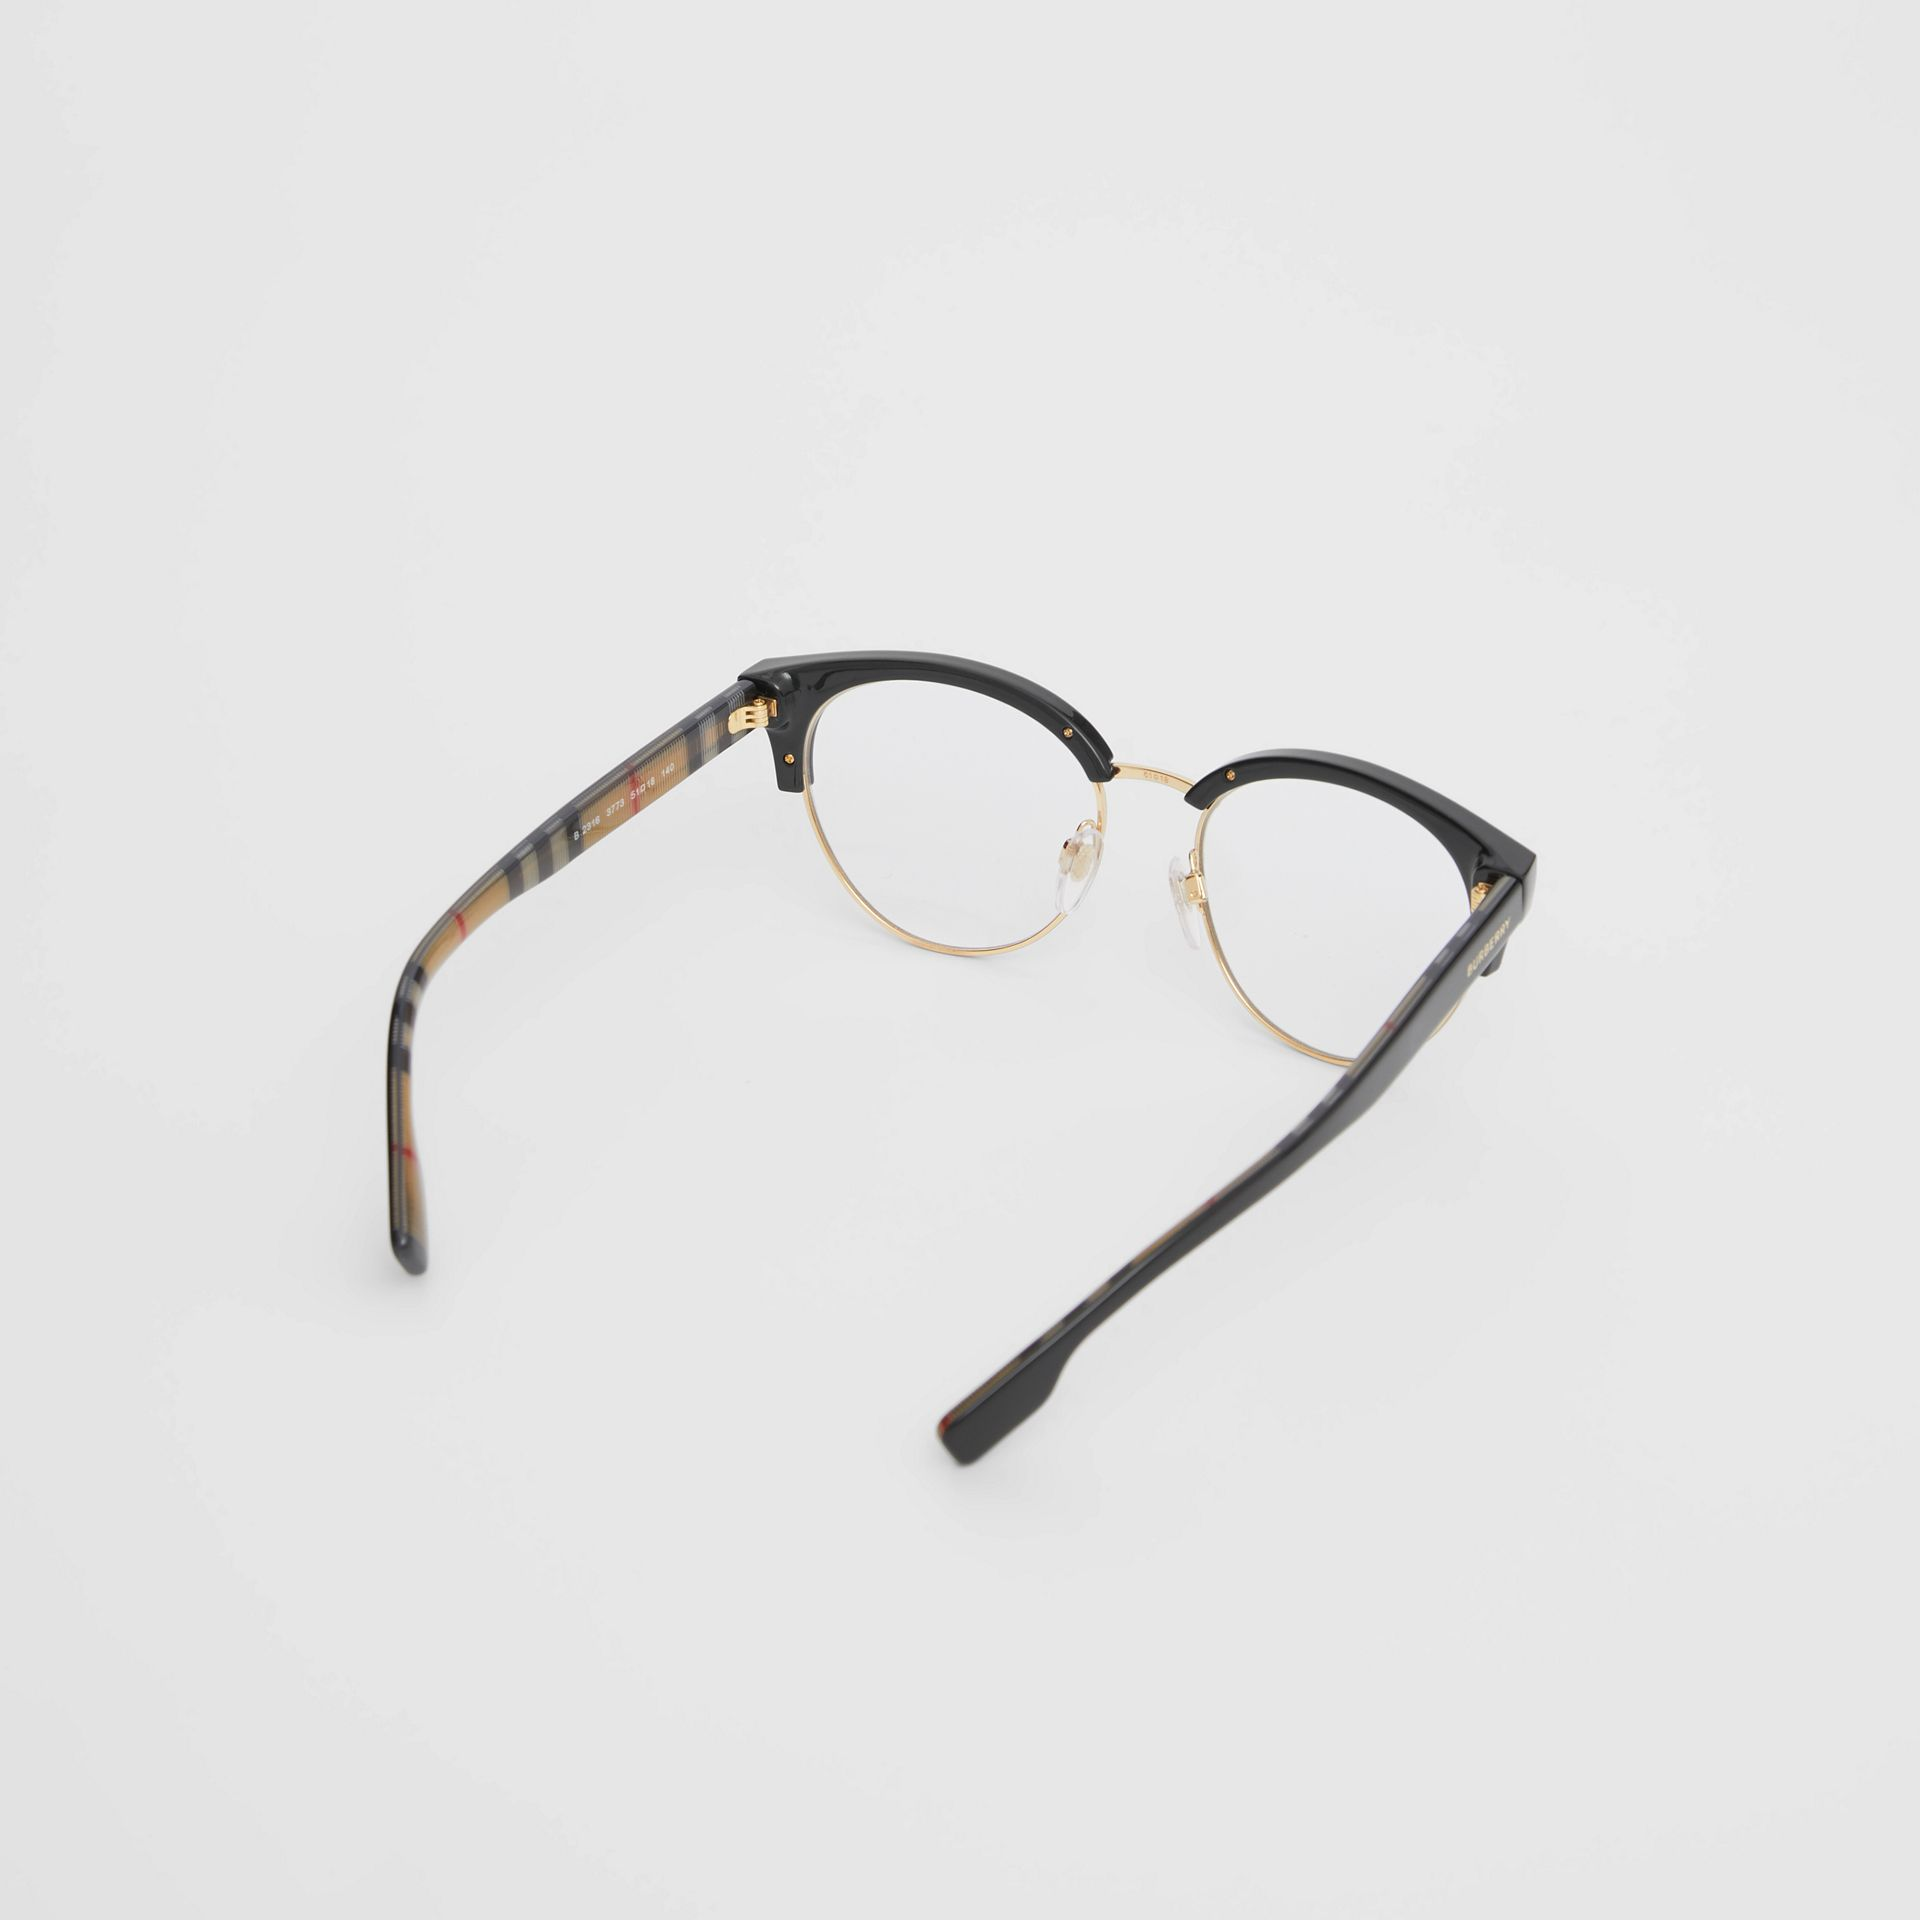 Cat-eye Optical Frames in Black/beige - Women | Burberry Australia - gallery image 4